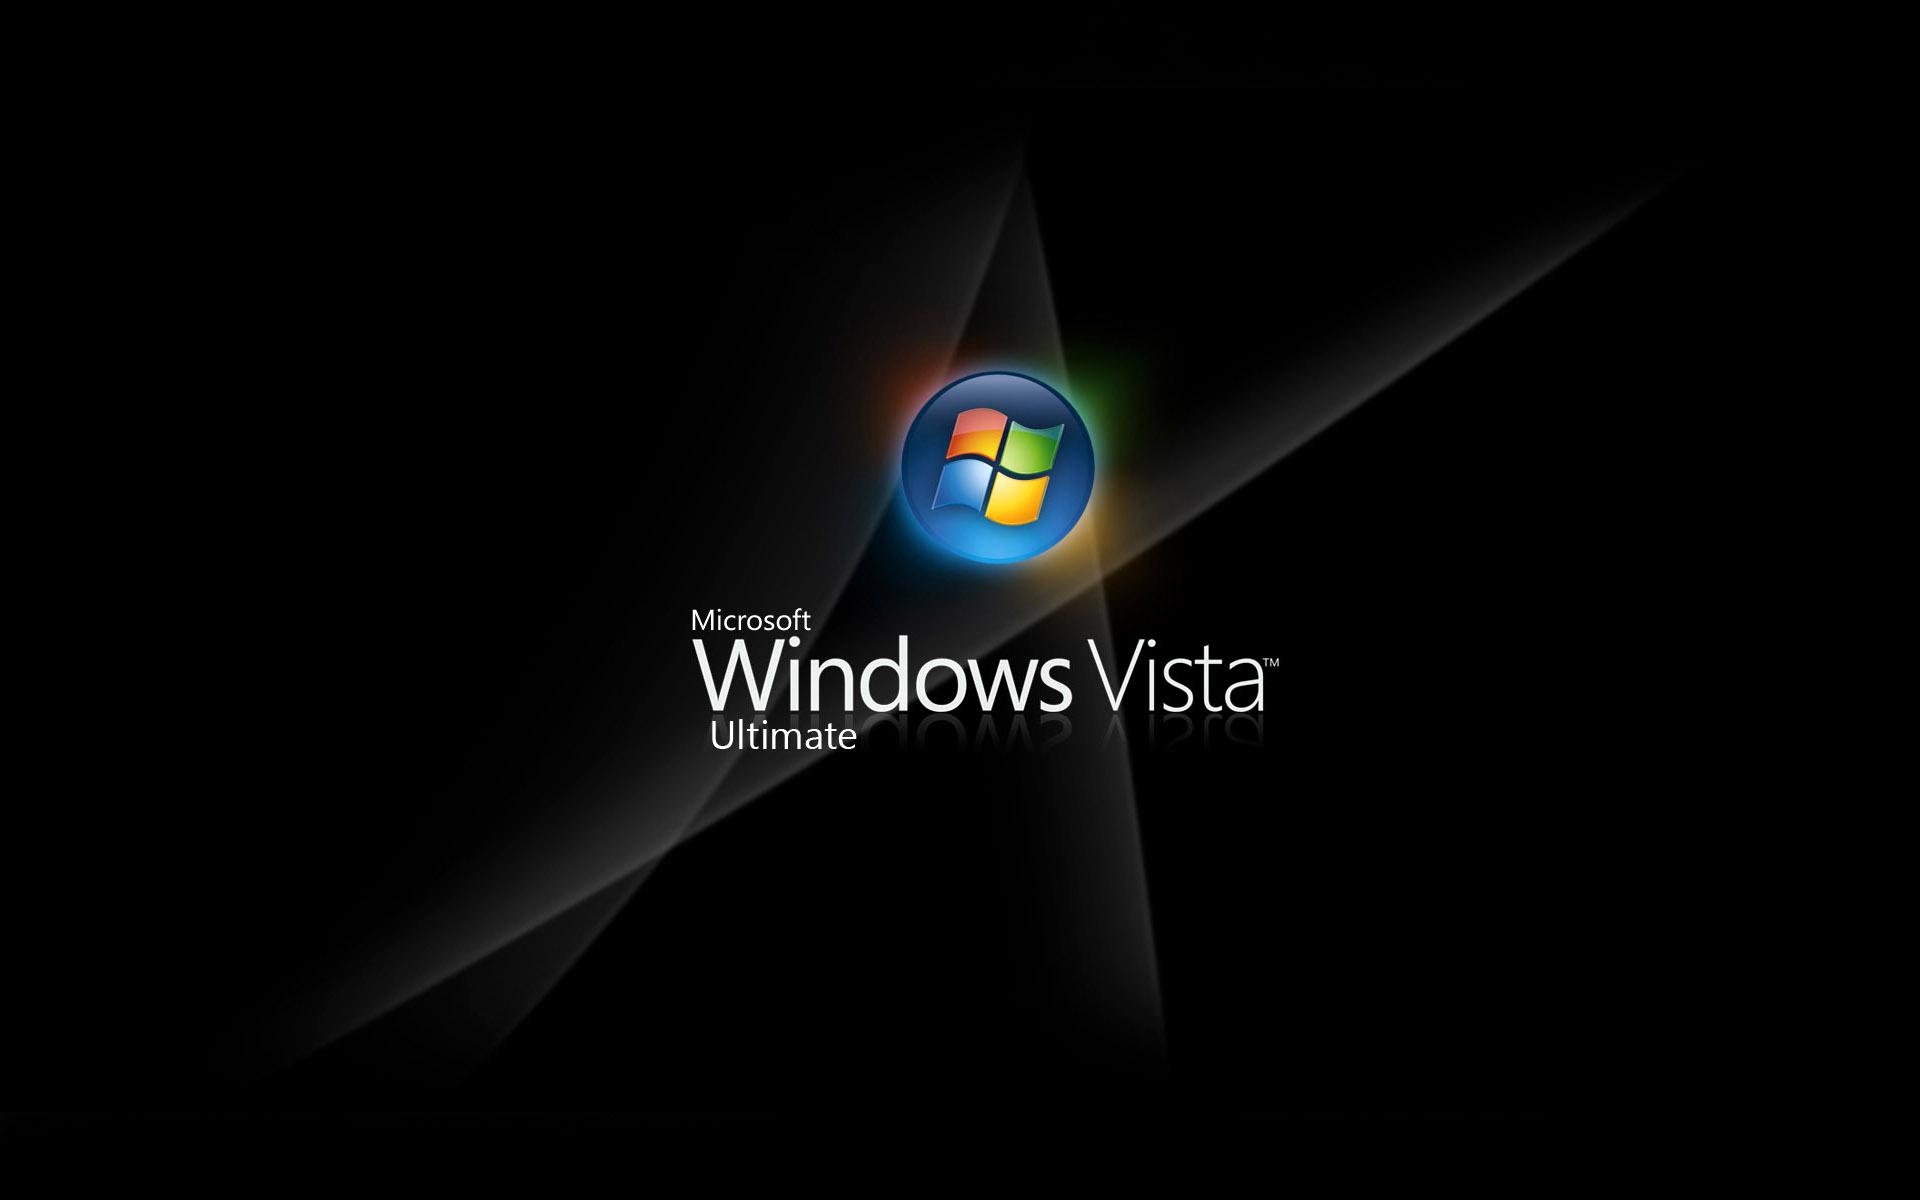 Windows vista ultimate clipart.